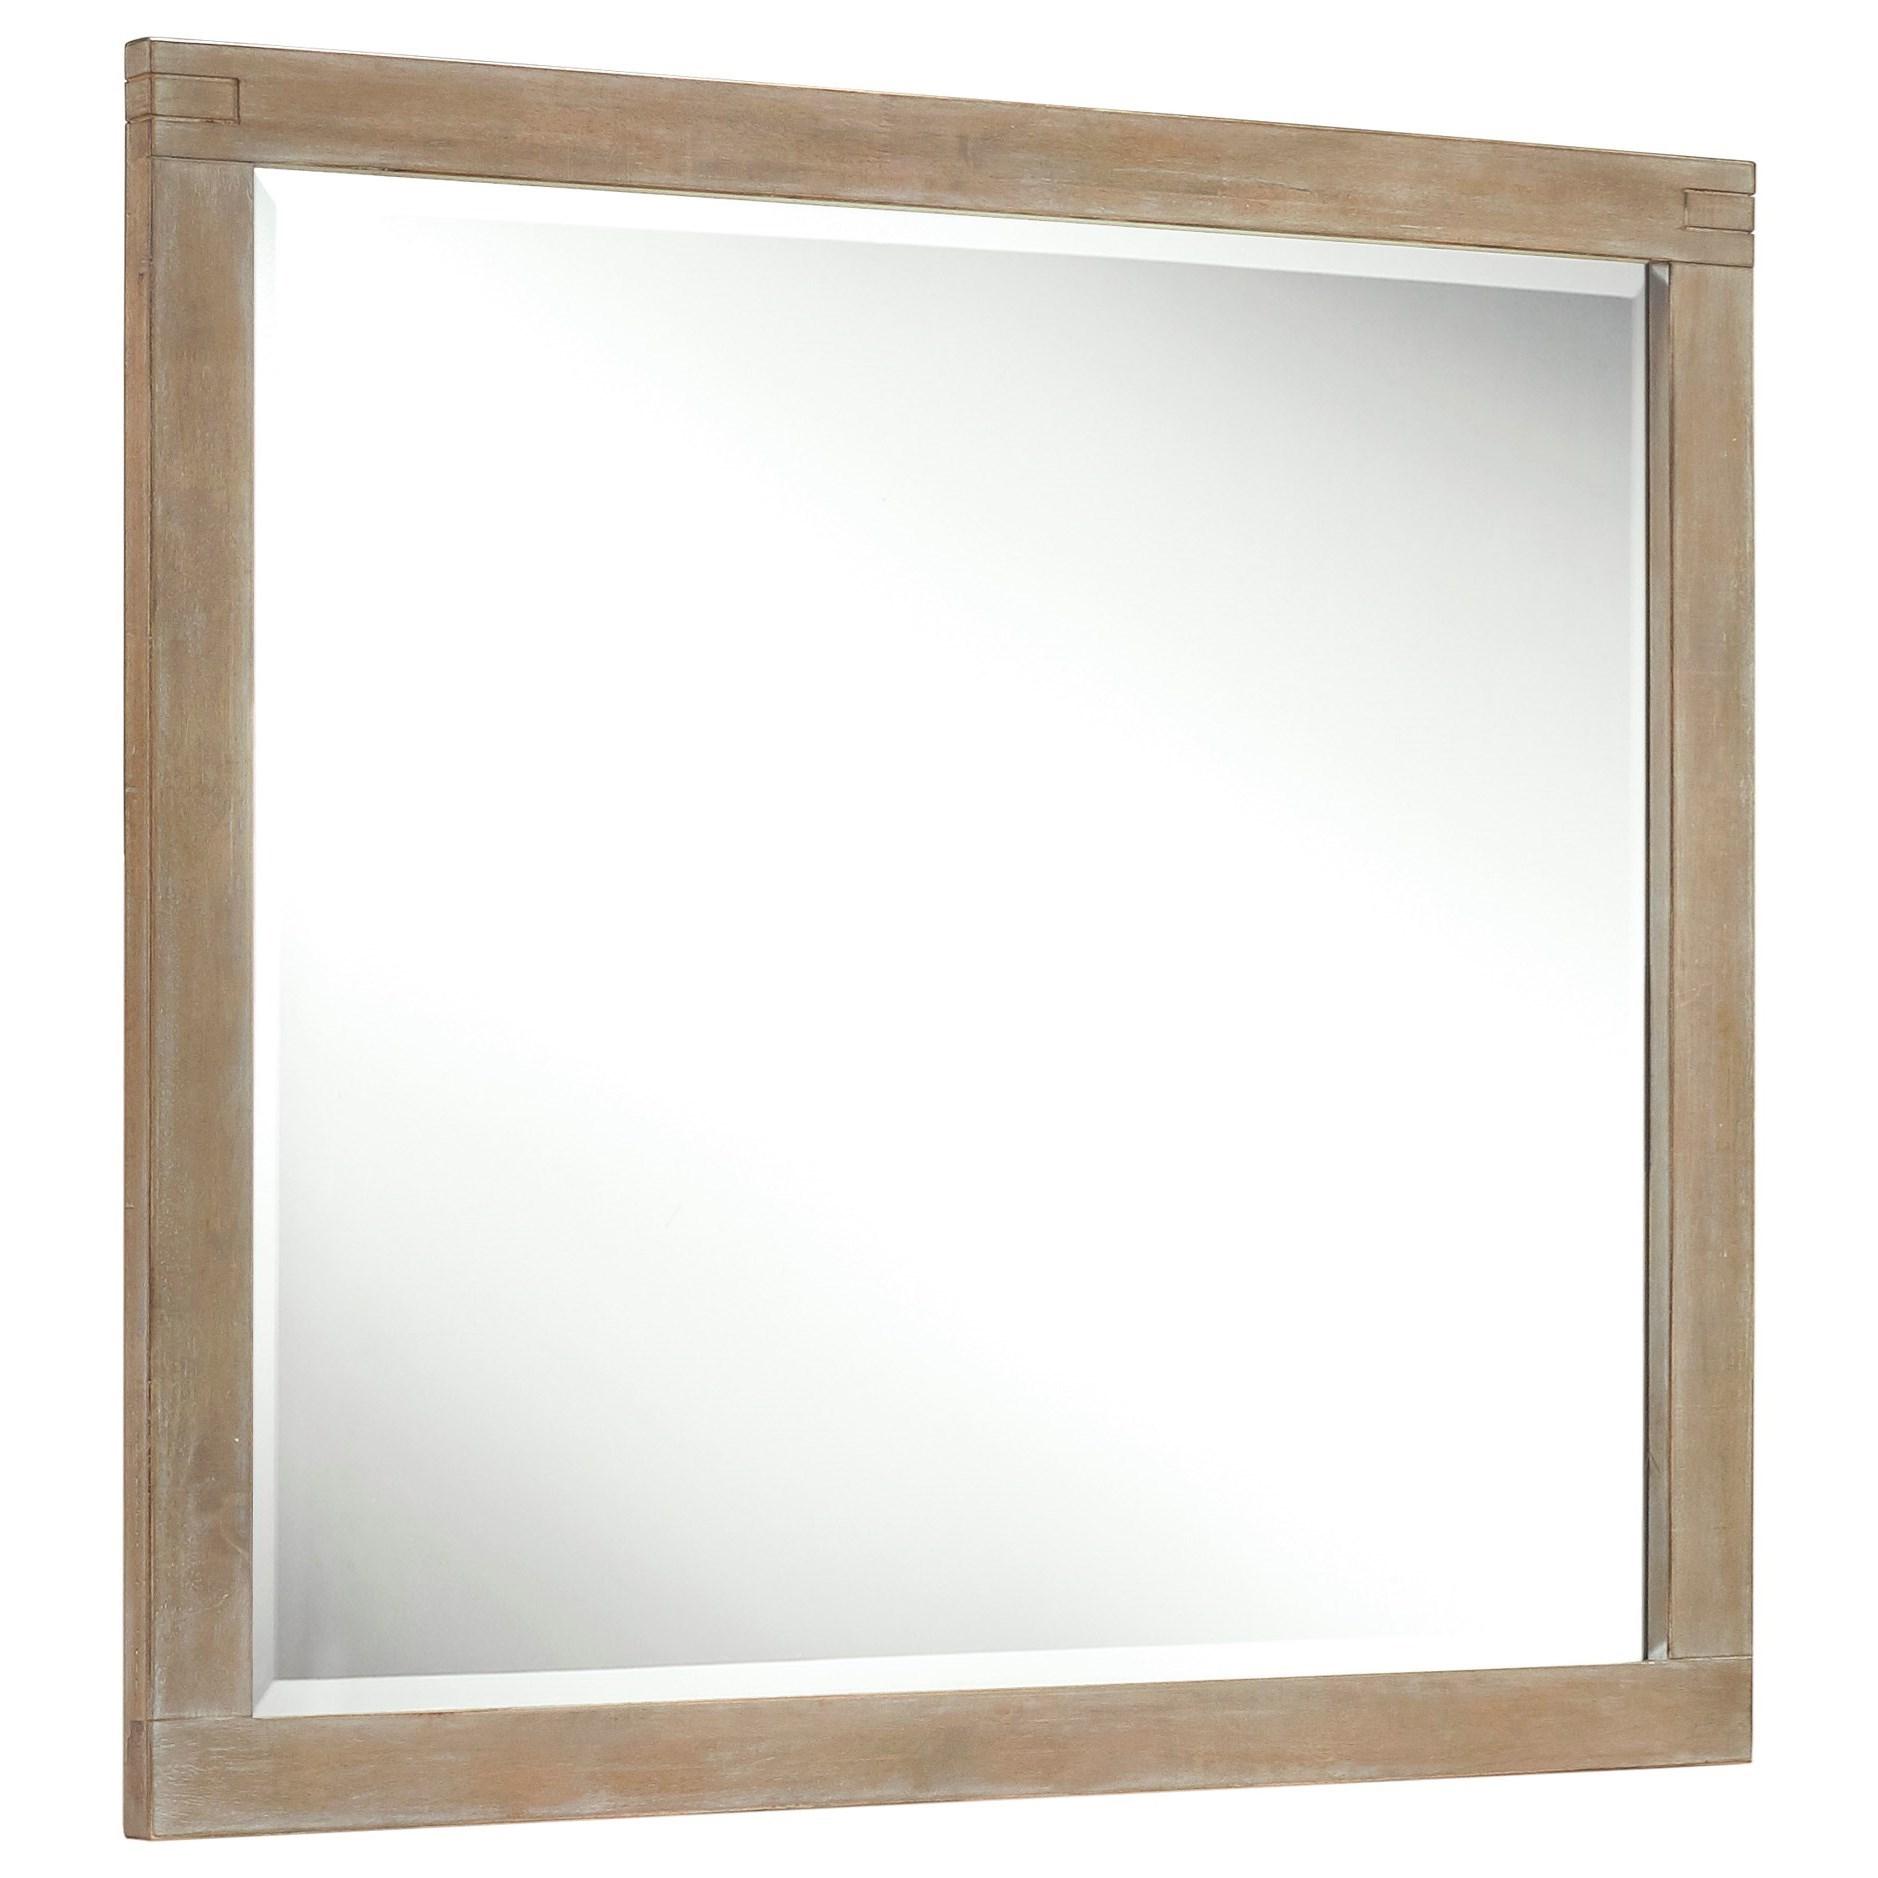 Ambrosh Mirror by Ashley Furniture at HomeWorld Furniture